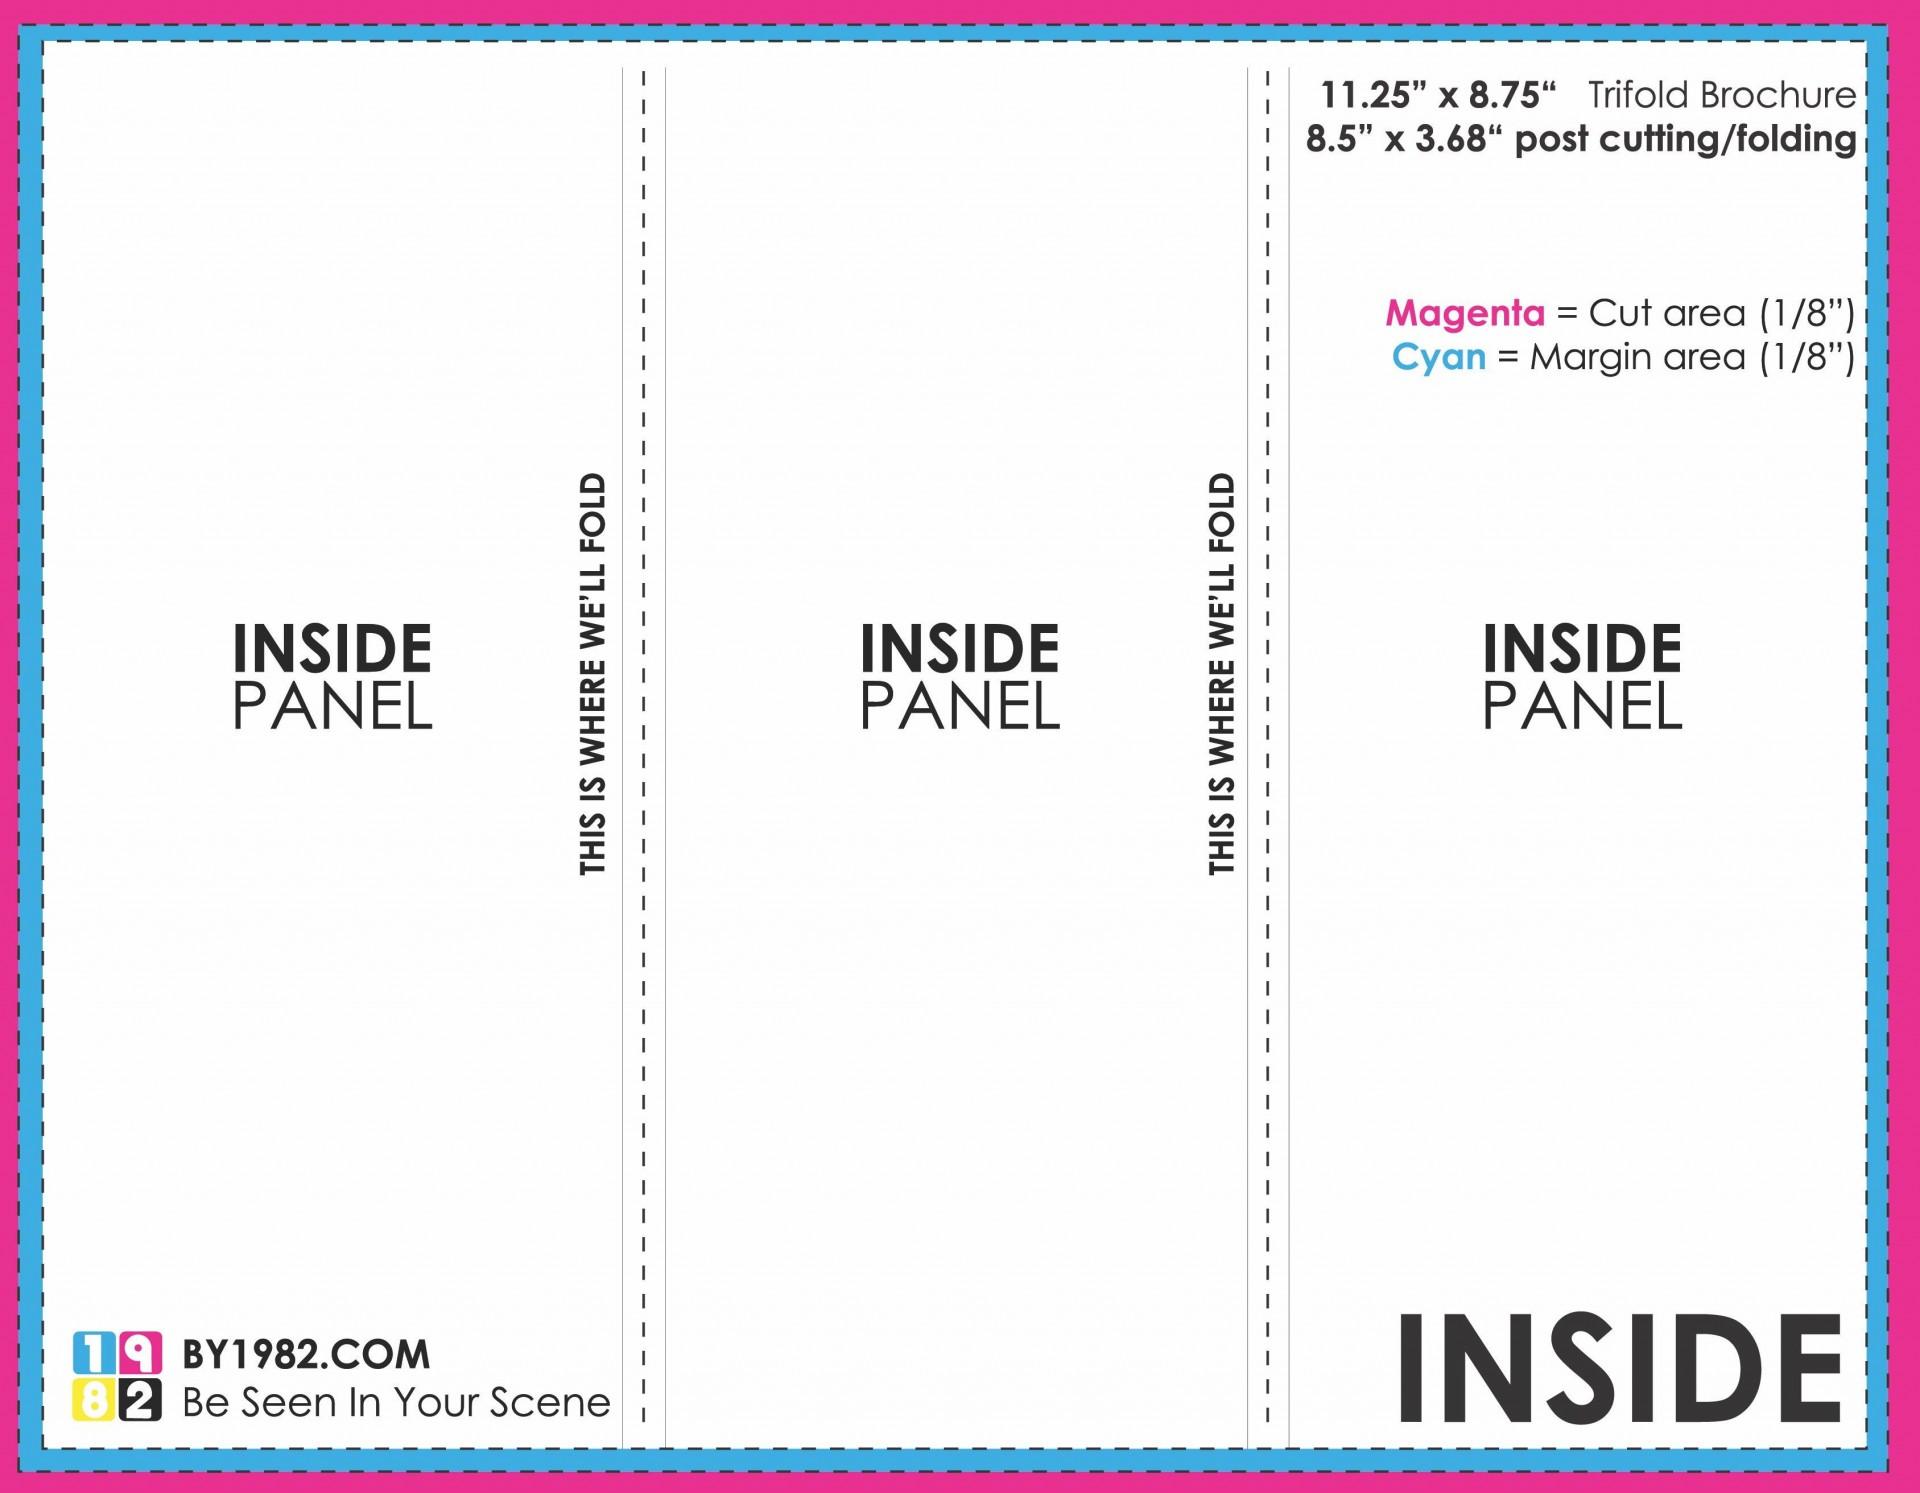 003 Unbelievable Three Fold Brochure Template Google Doc Photo  Docs1920